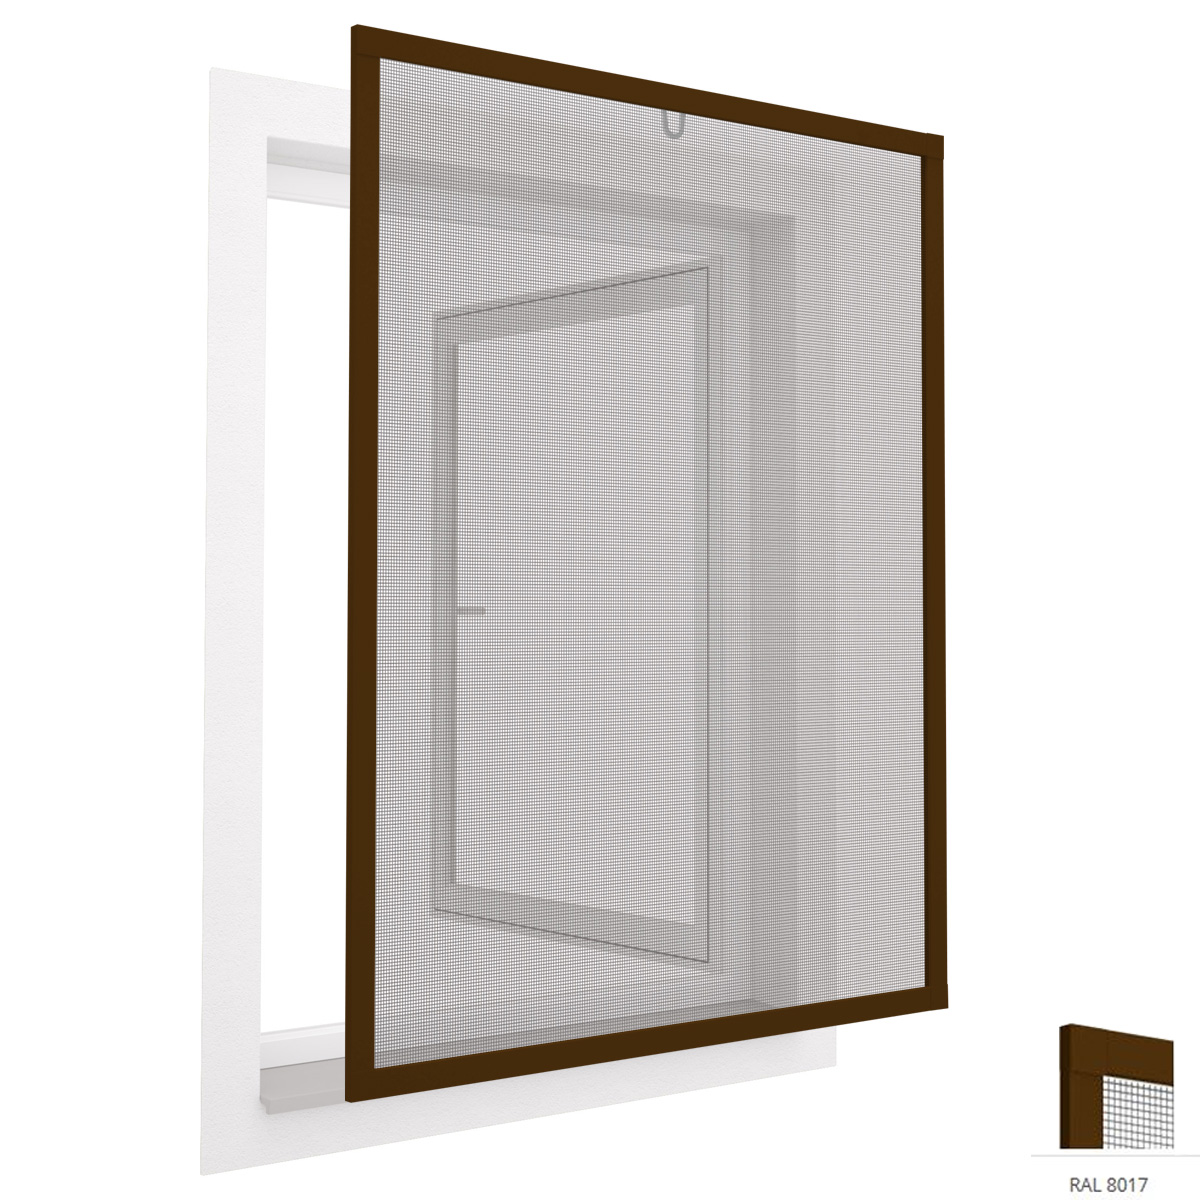 insektenschutzfenster fliegengitter mit alu rahmen. Black Bedroom Furniture Sets. Home Design Ideas